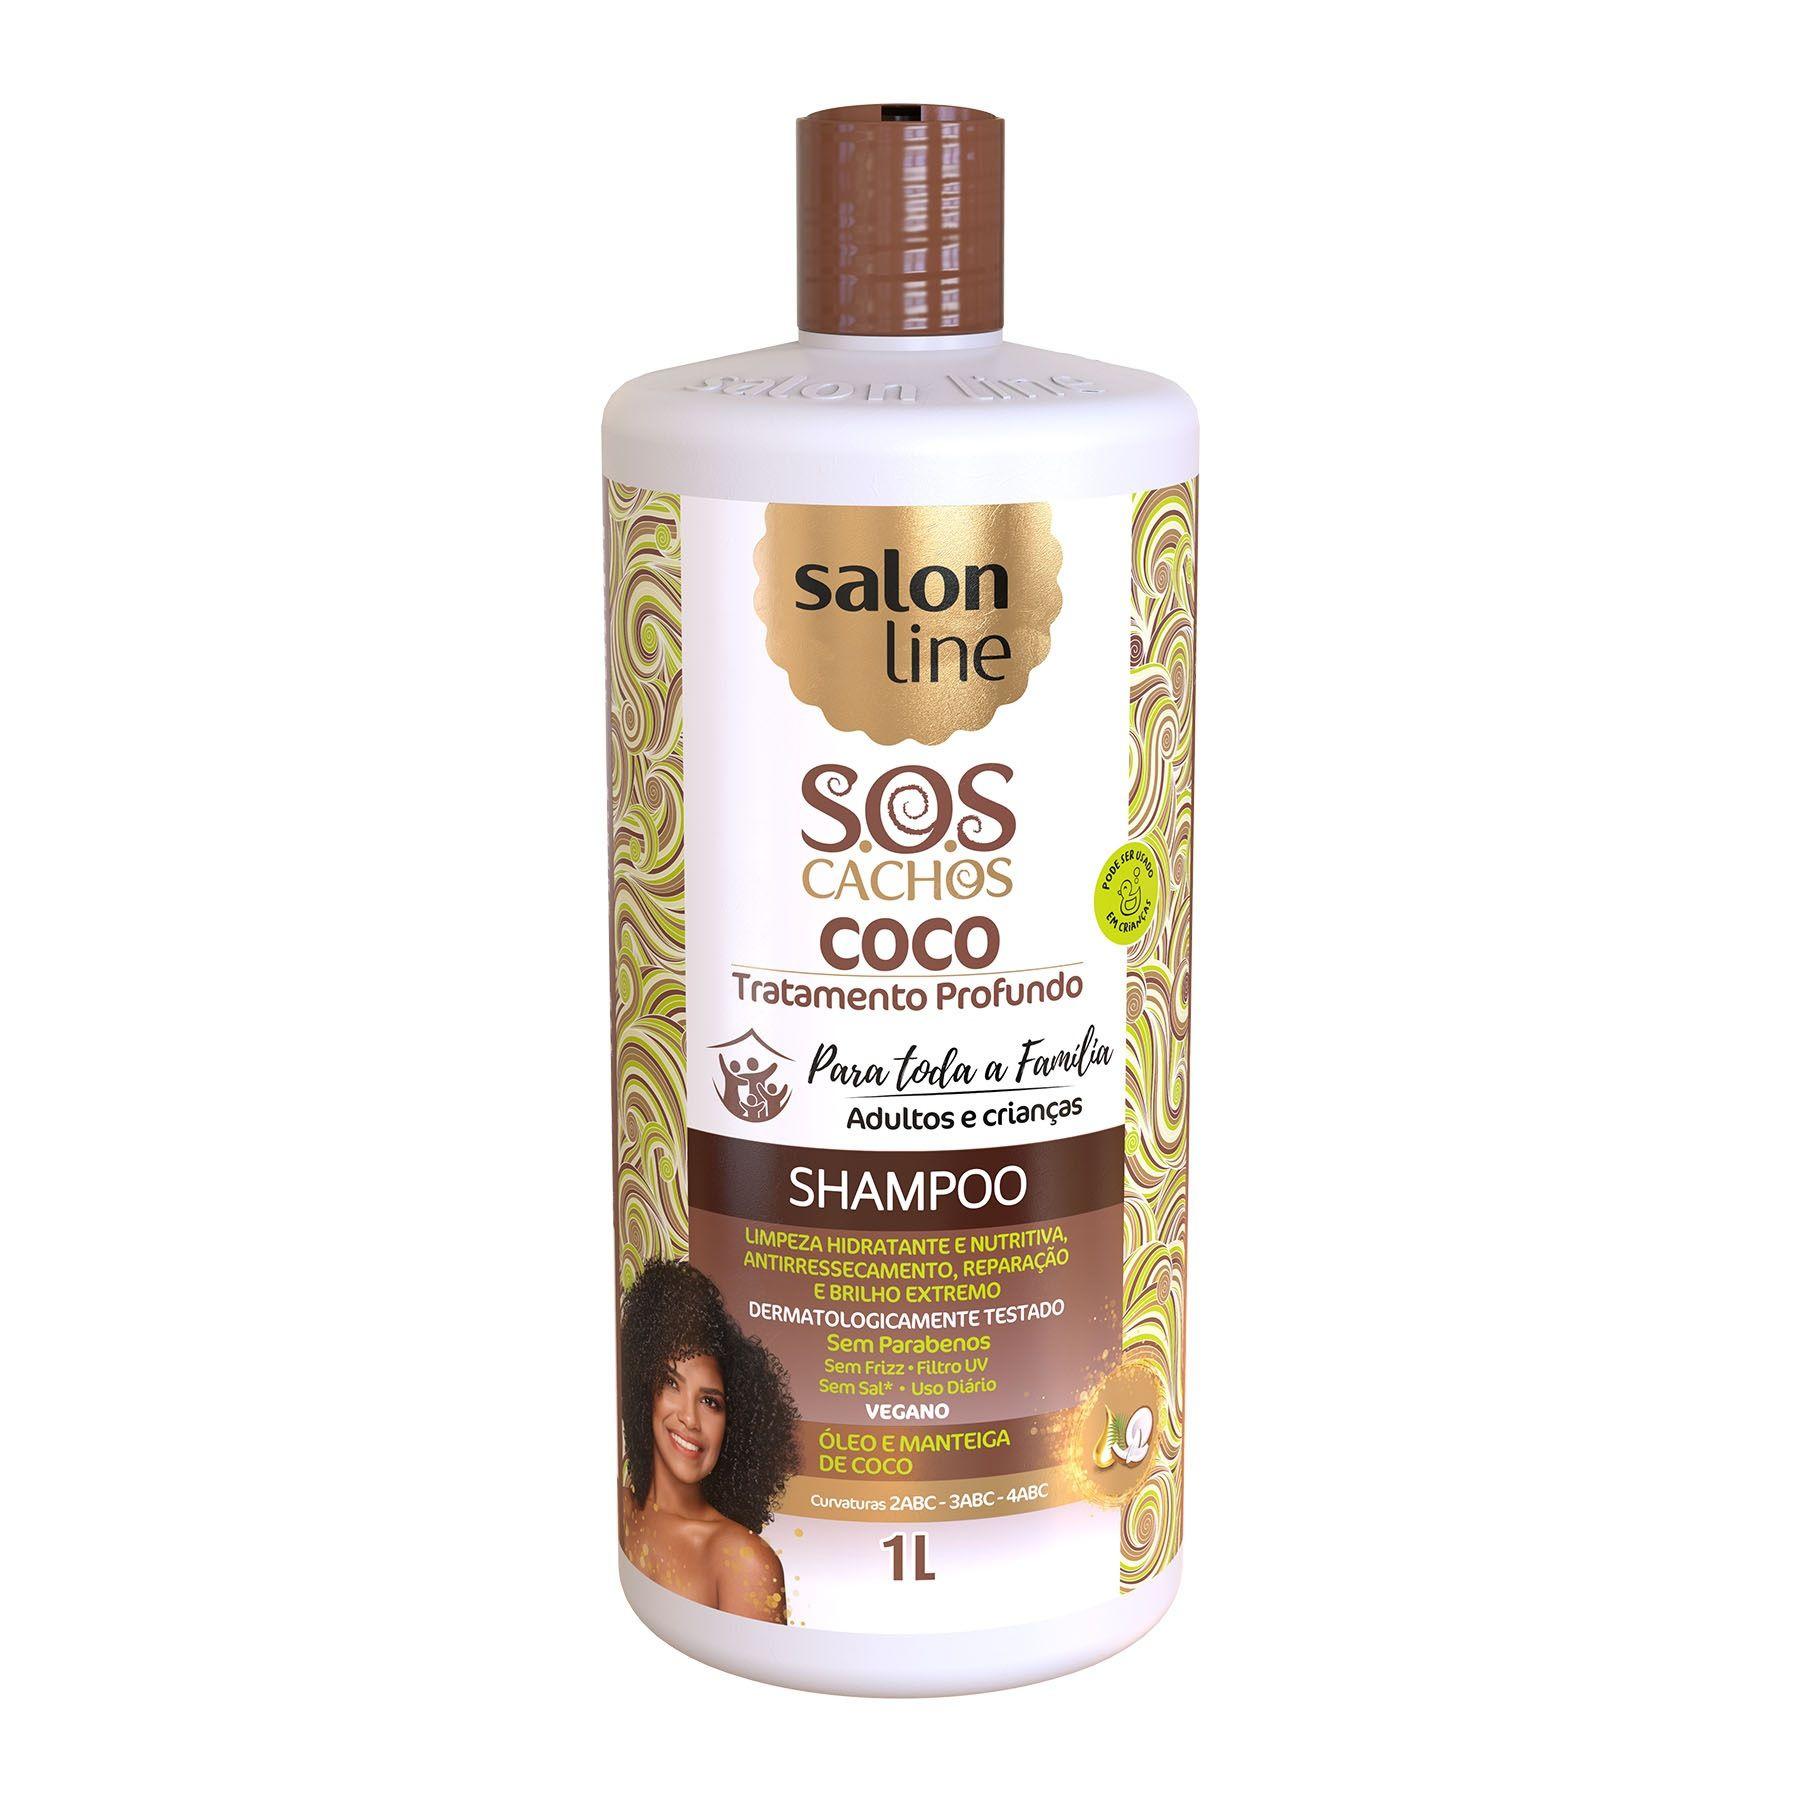 Shampoo Coco Tratam Profu SOS Cachos 1L Salon Line